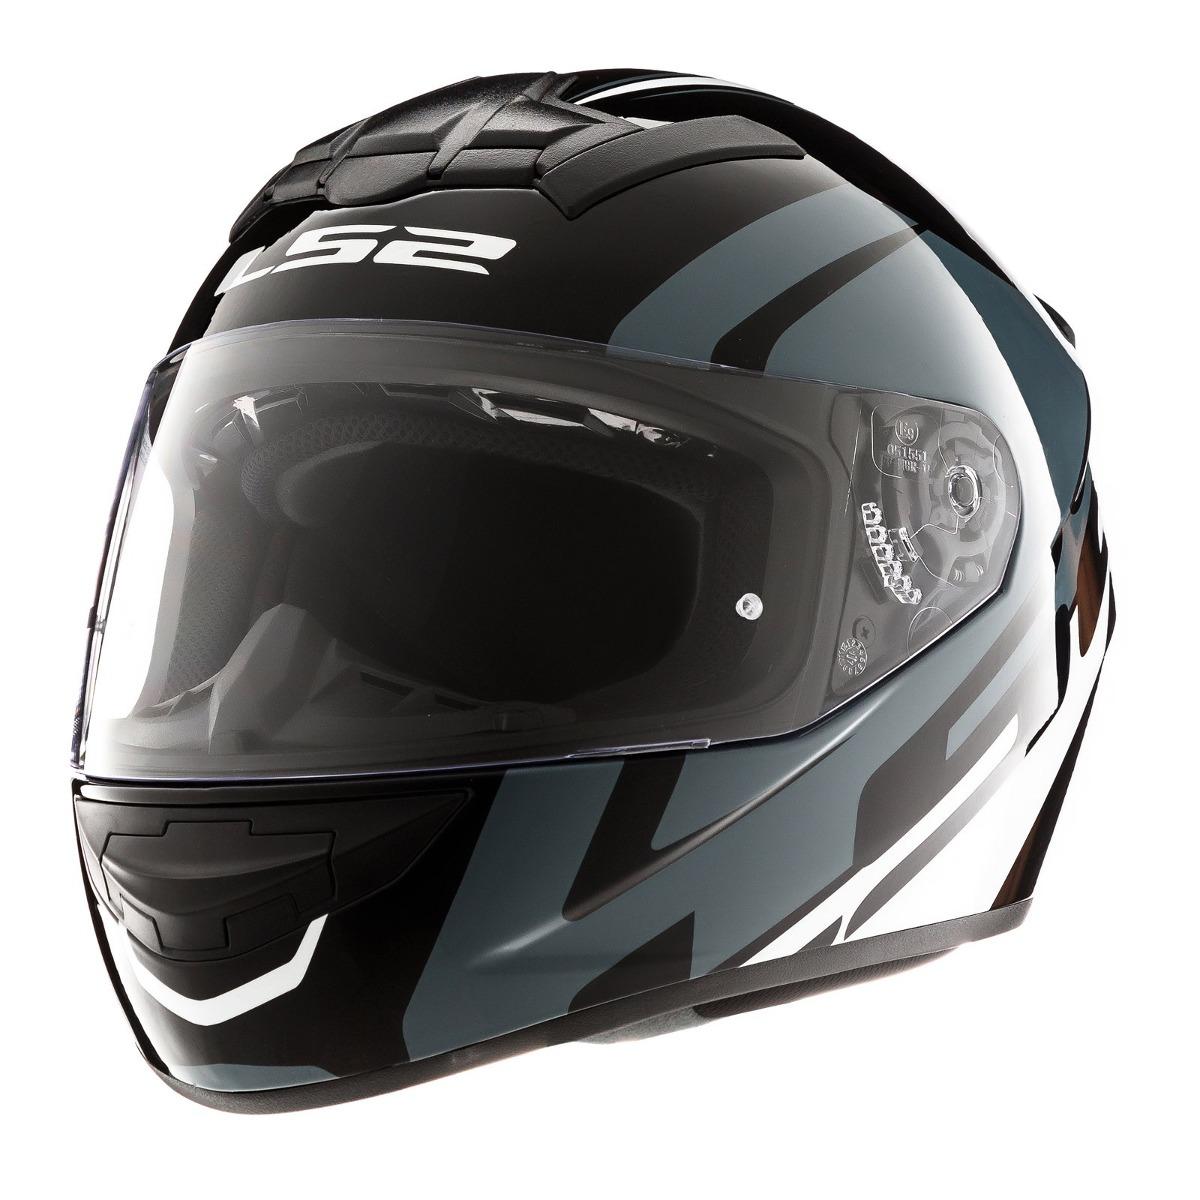 c3f7e29ab22b0 casco moto integral ls2 352 rookie tour negro gris blanco. Cargando zoom.